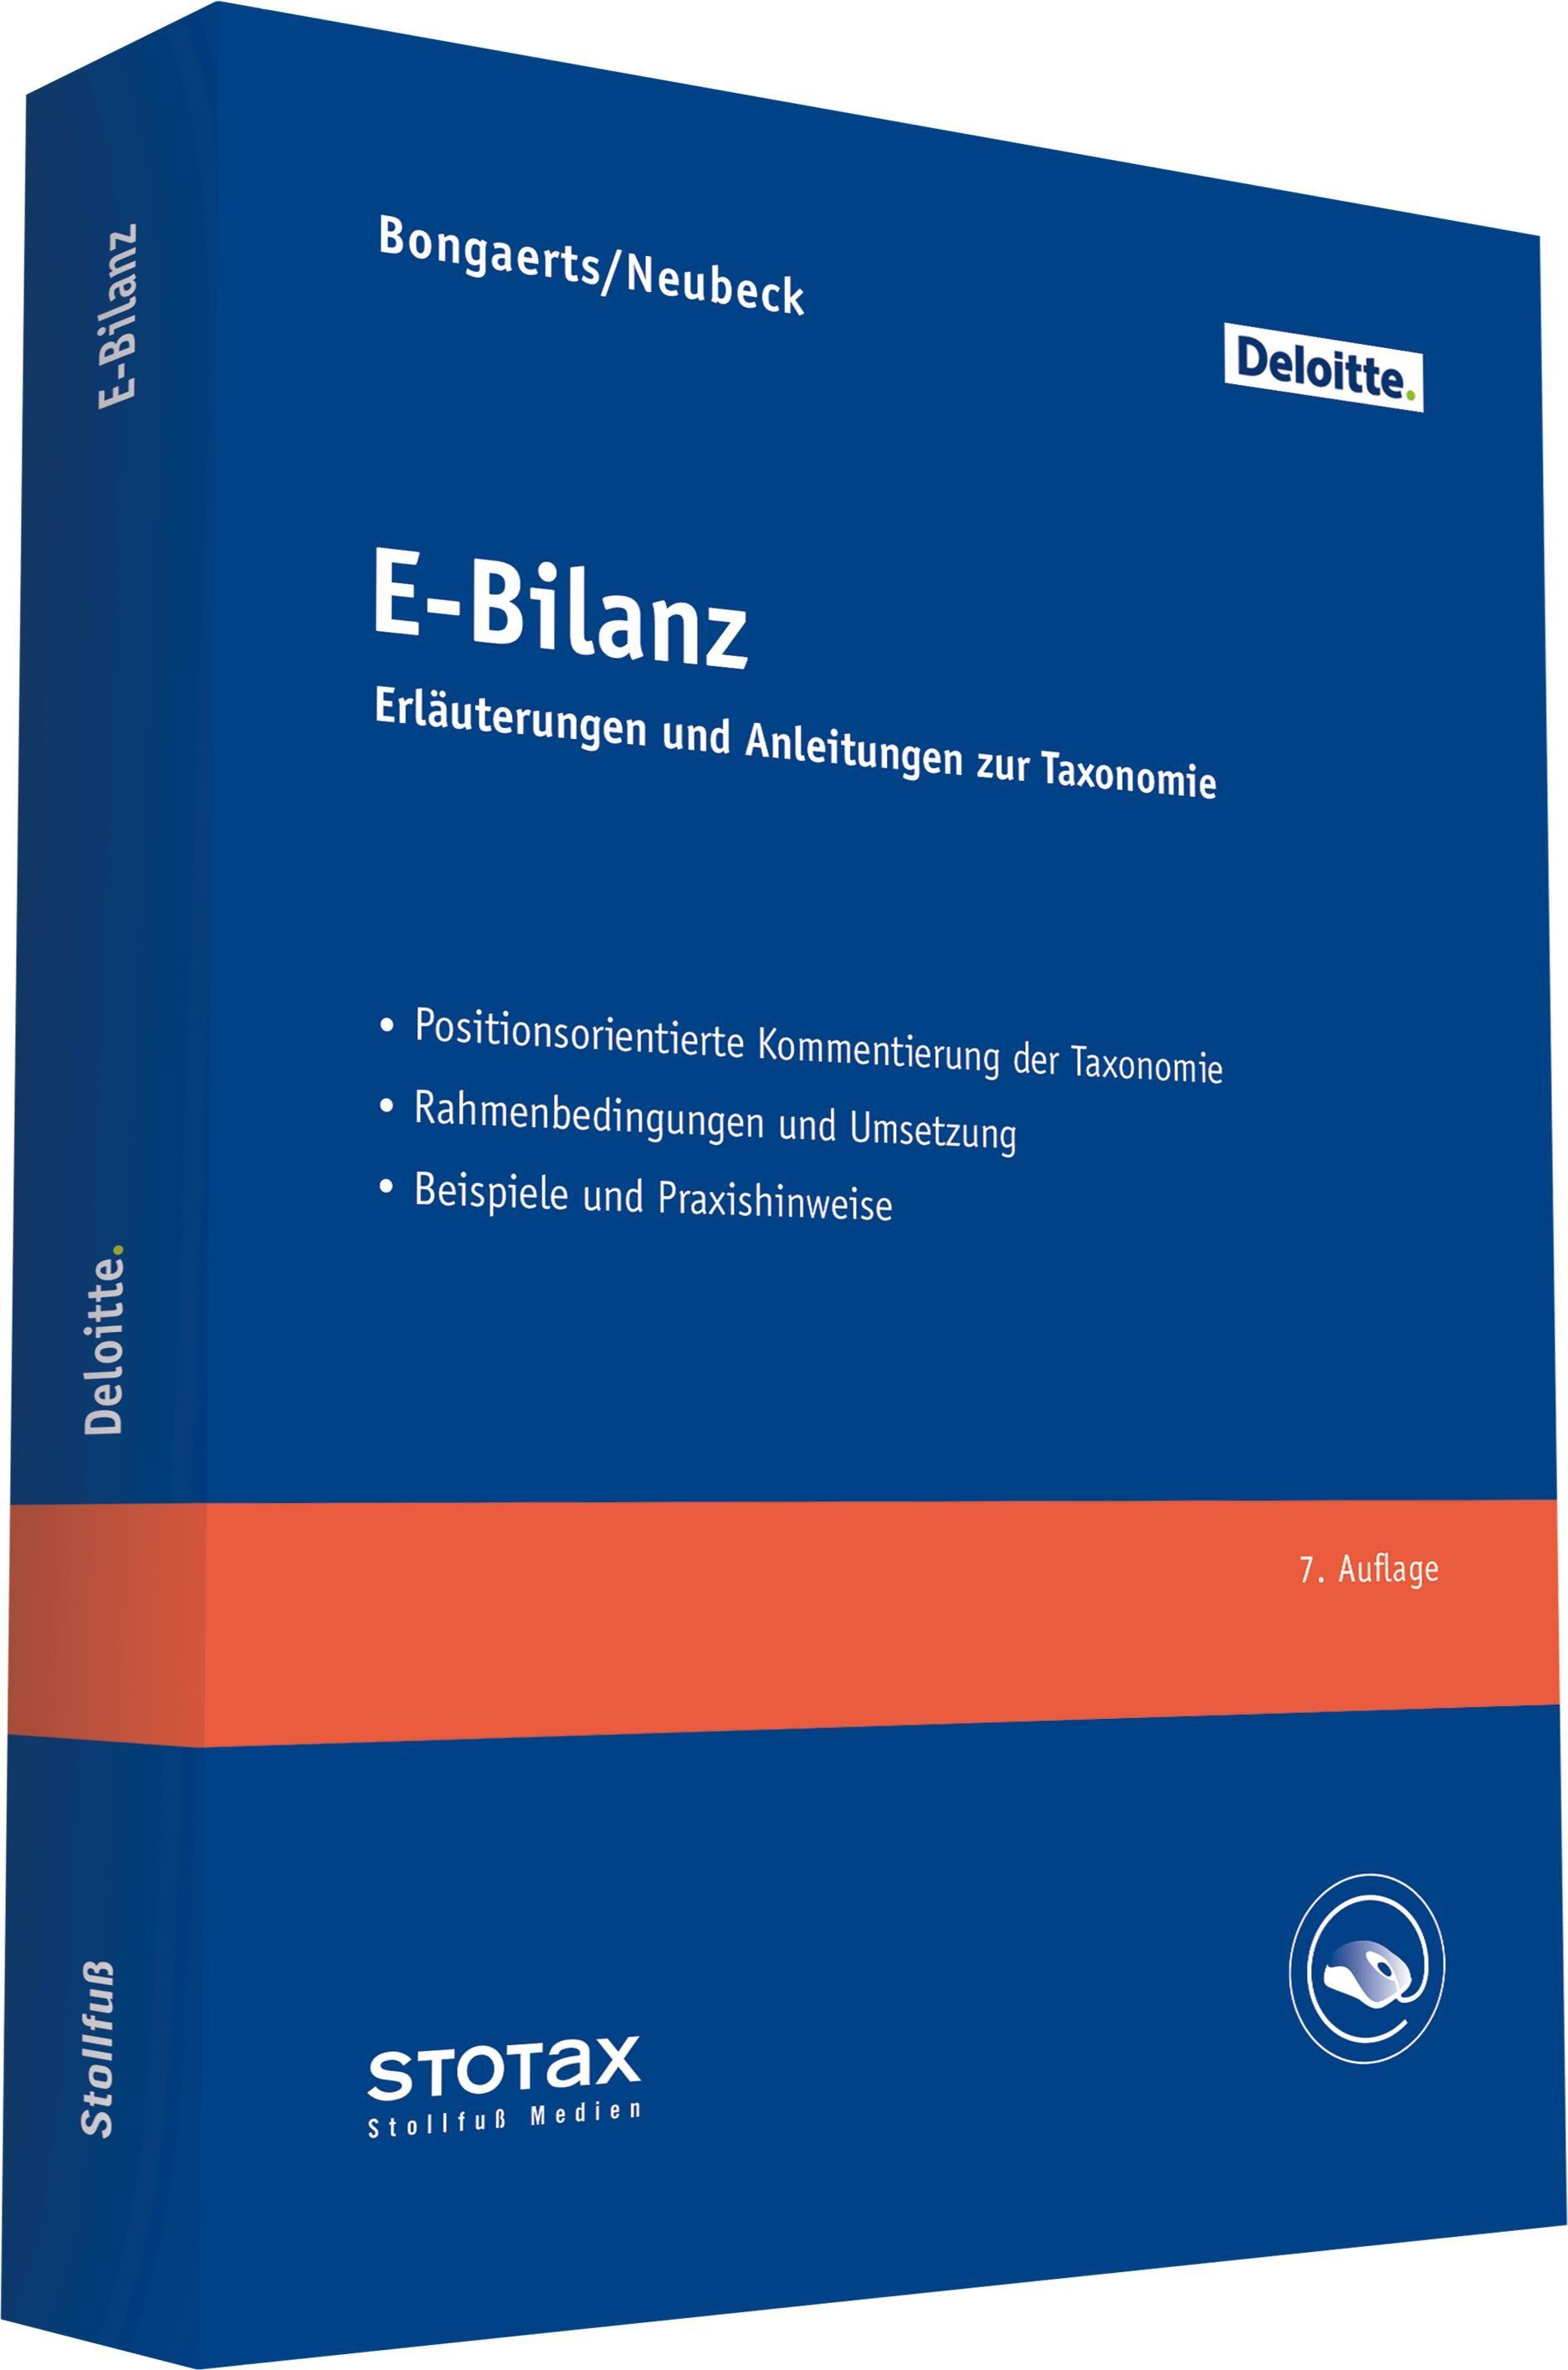 E-Bilanz | Bongaerts / Neubeck | 7. Auflage, 2019 | Buch (Cover)